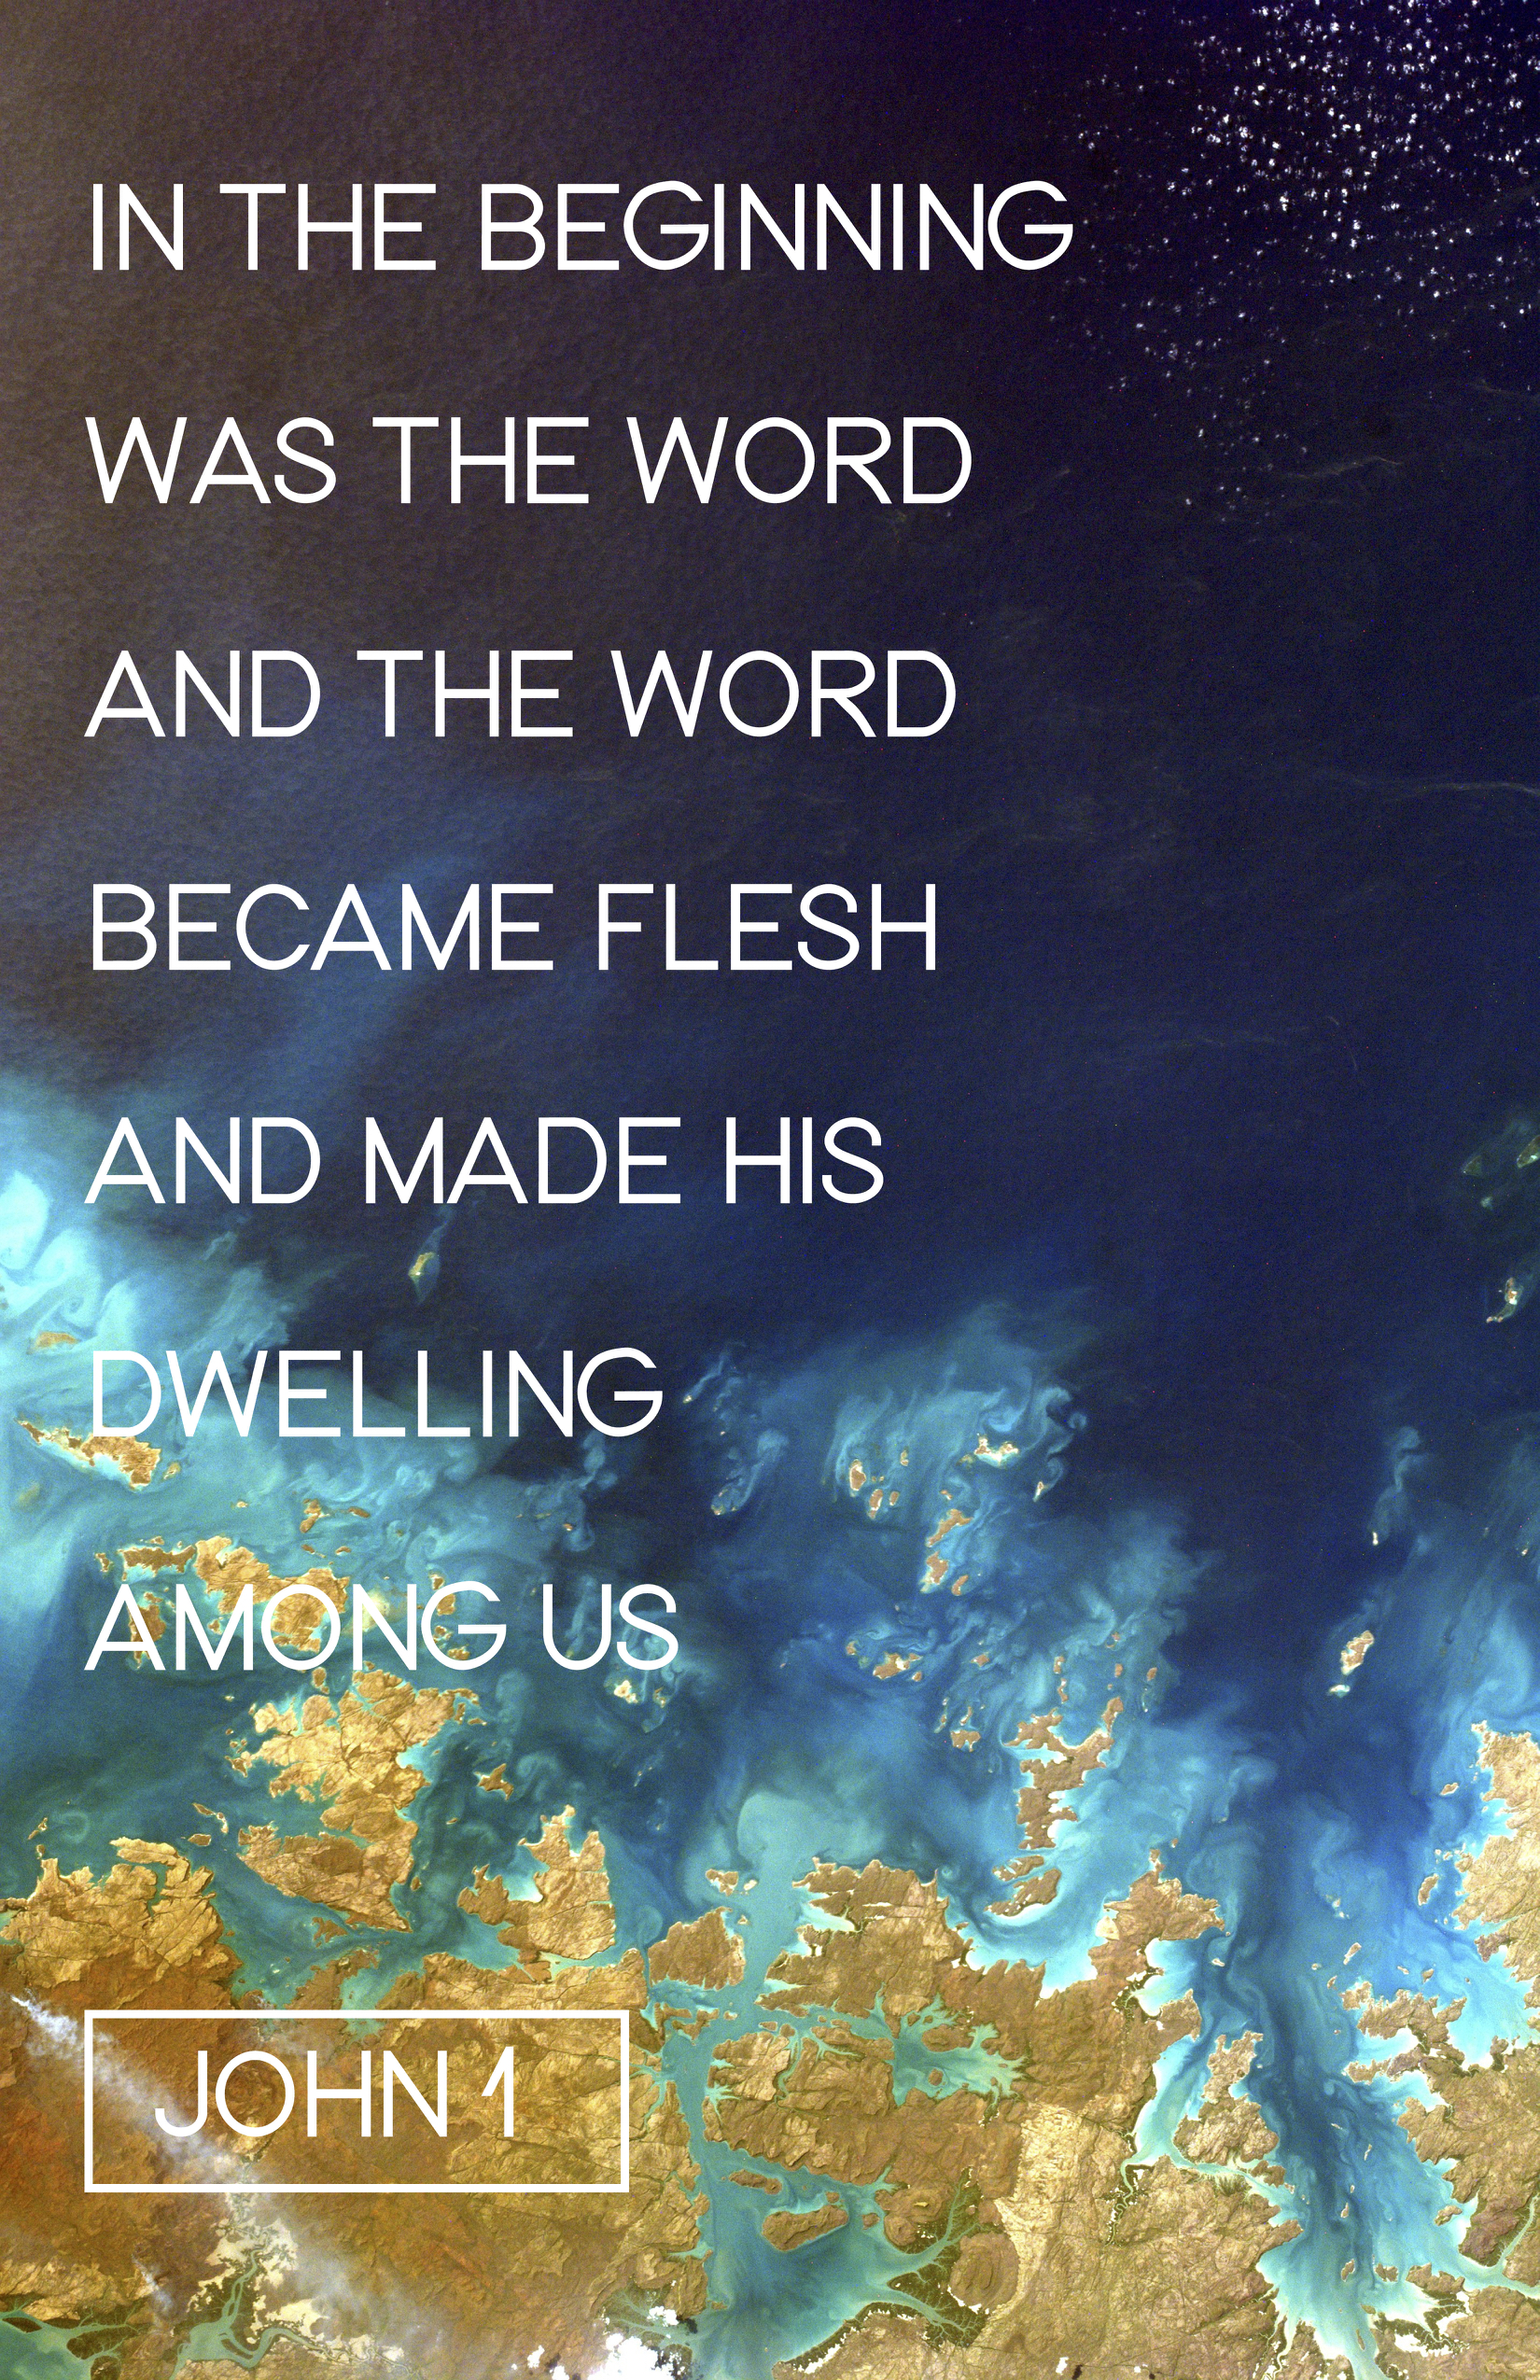 JOHN 1 WORD.jpeg